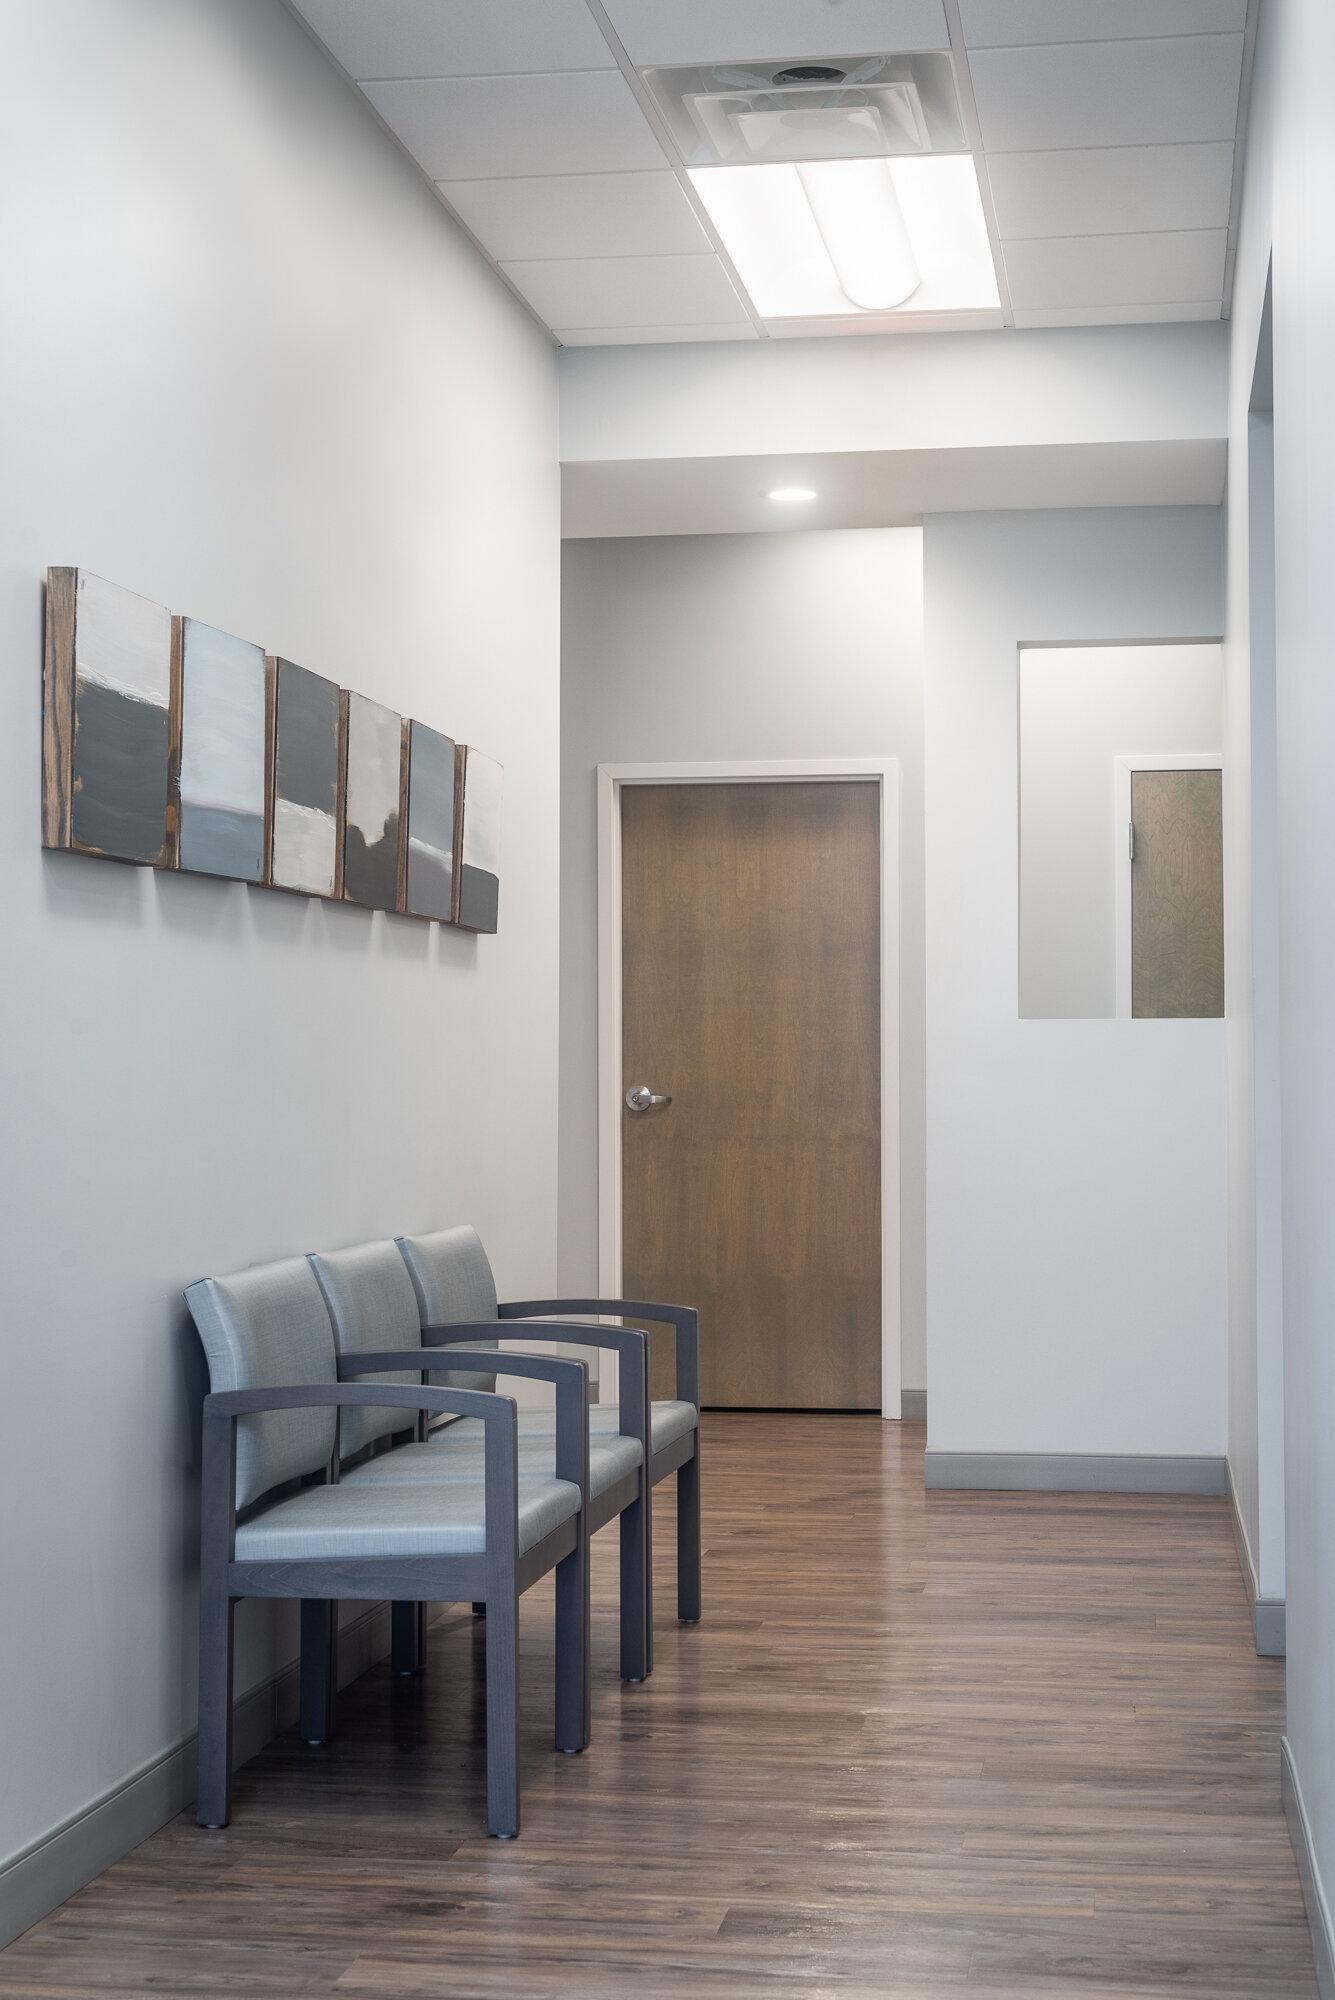 Micamy Design Studio_Interior Design_Faben Obstetrics and Gynelcology_North Florida_Riverplace_San Marco_Healthcare_Office_Medical_Trwobridge_Renovation_Patcraft_Stance_ArcCom (8).jpg